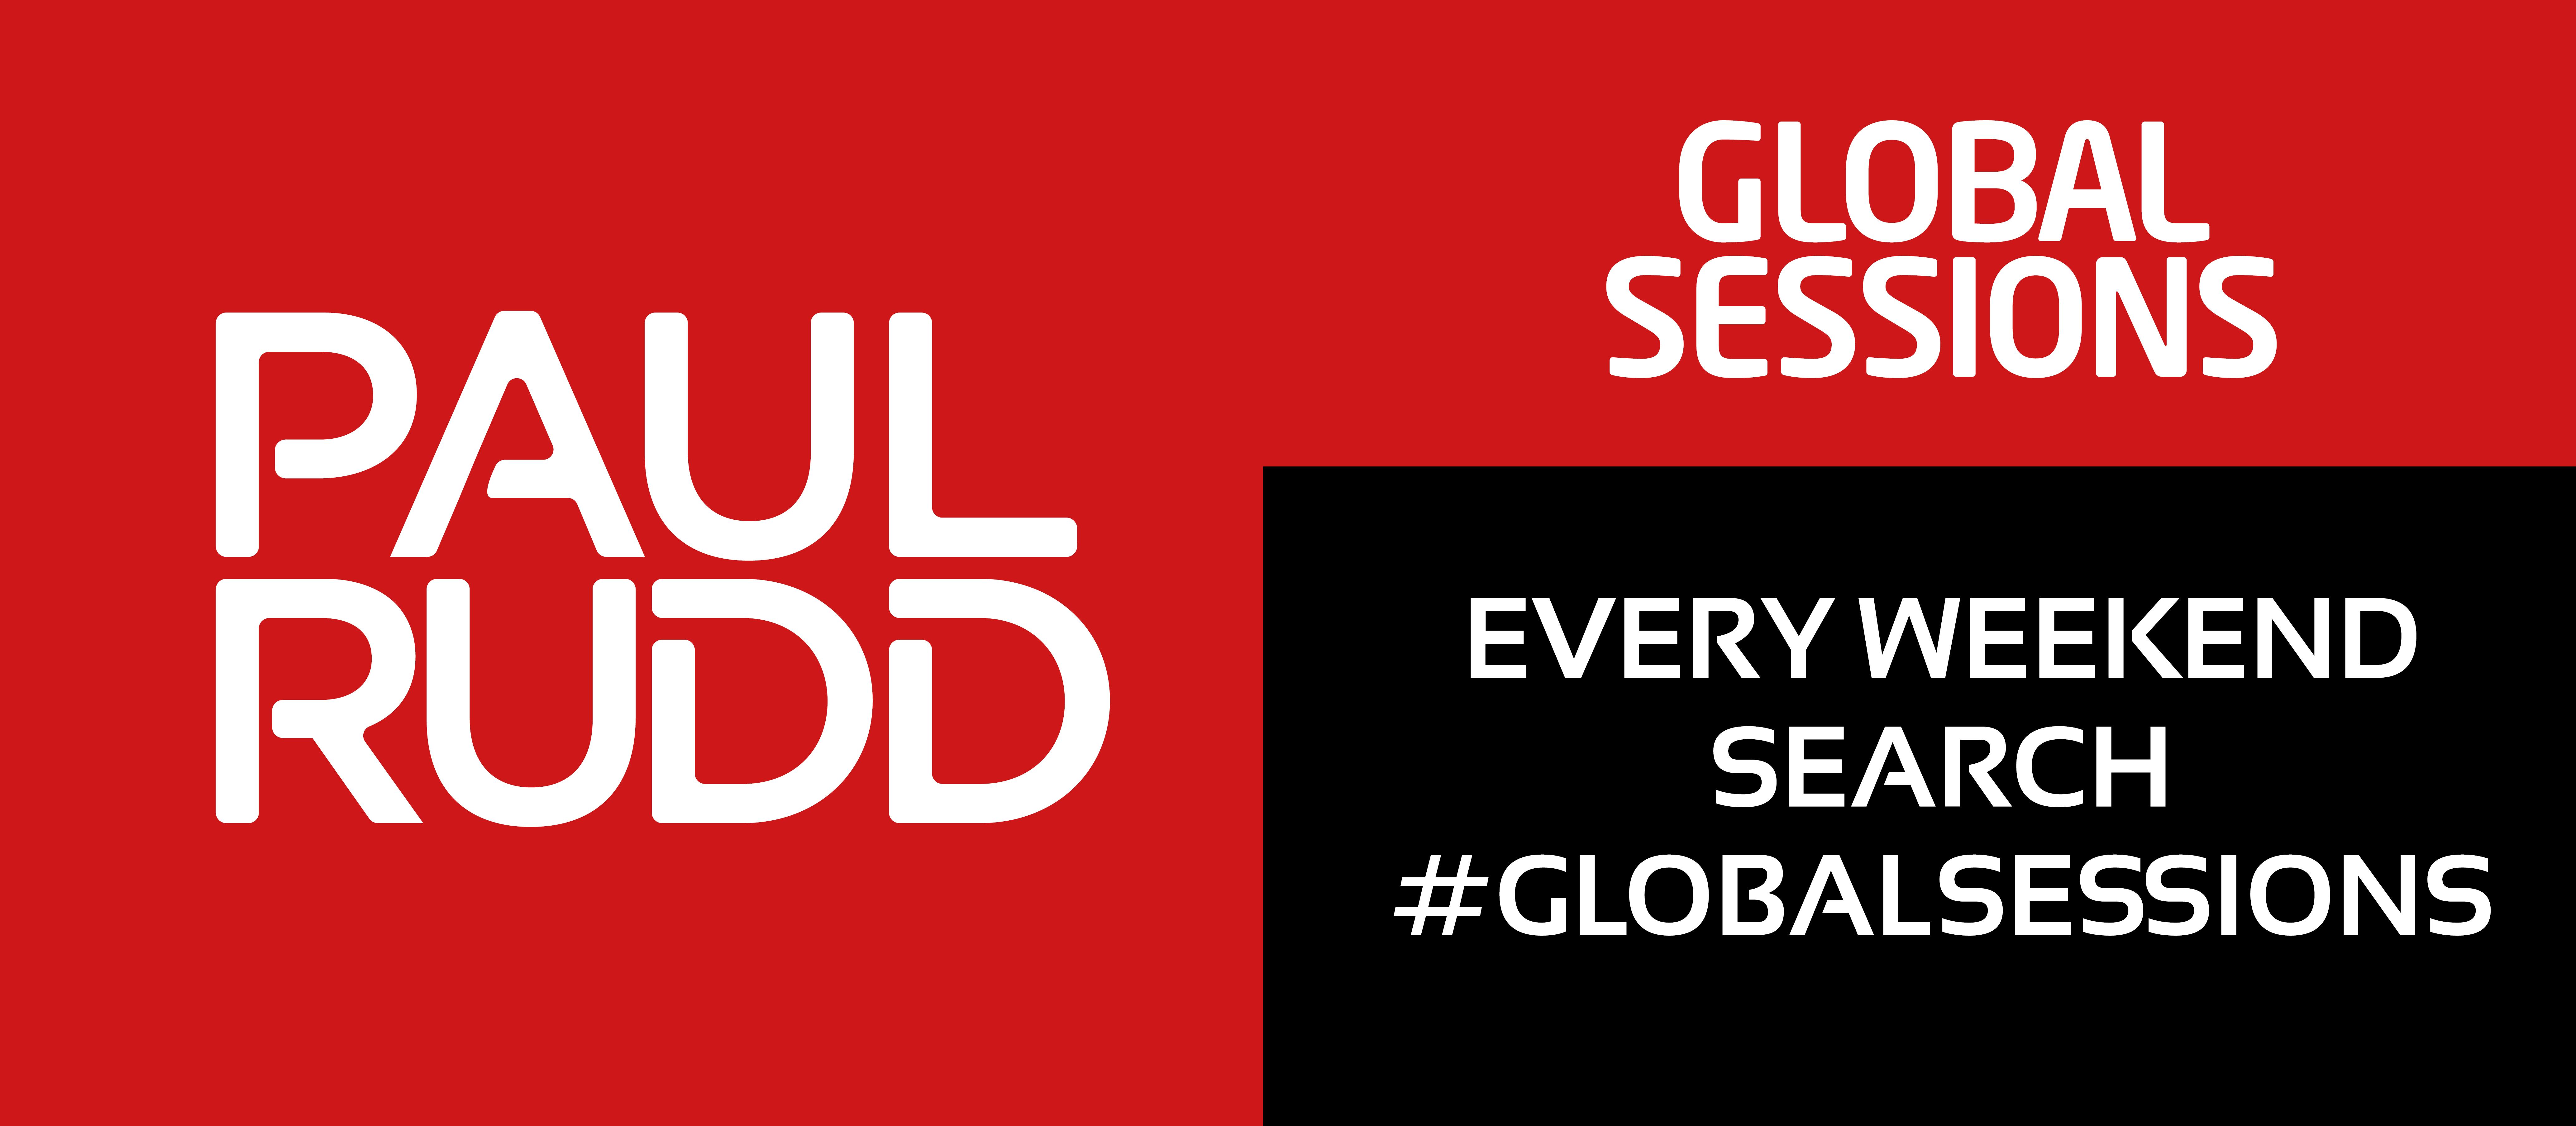 DJ Paul Rudd Globalsessions